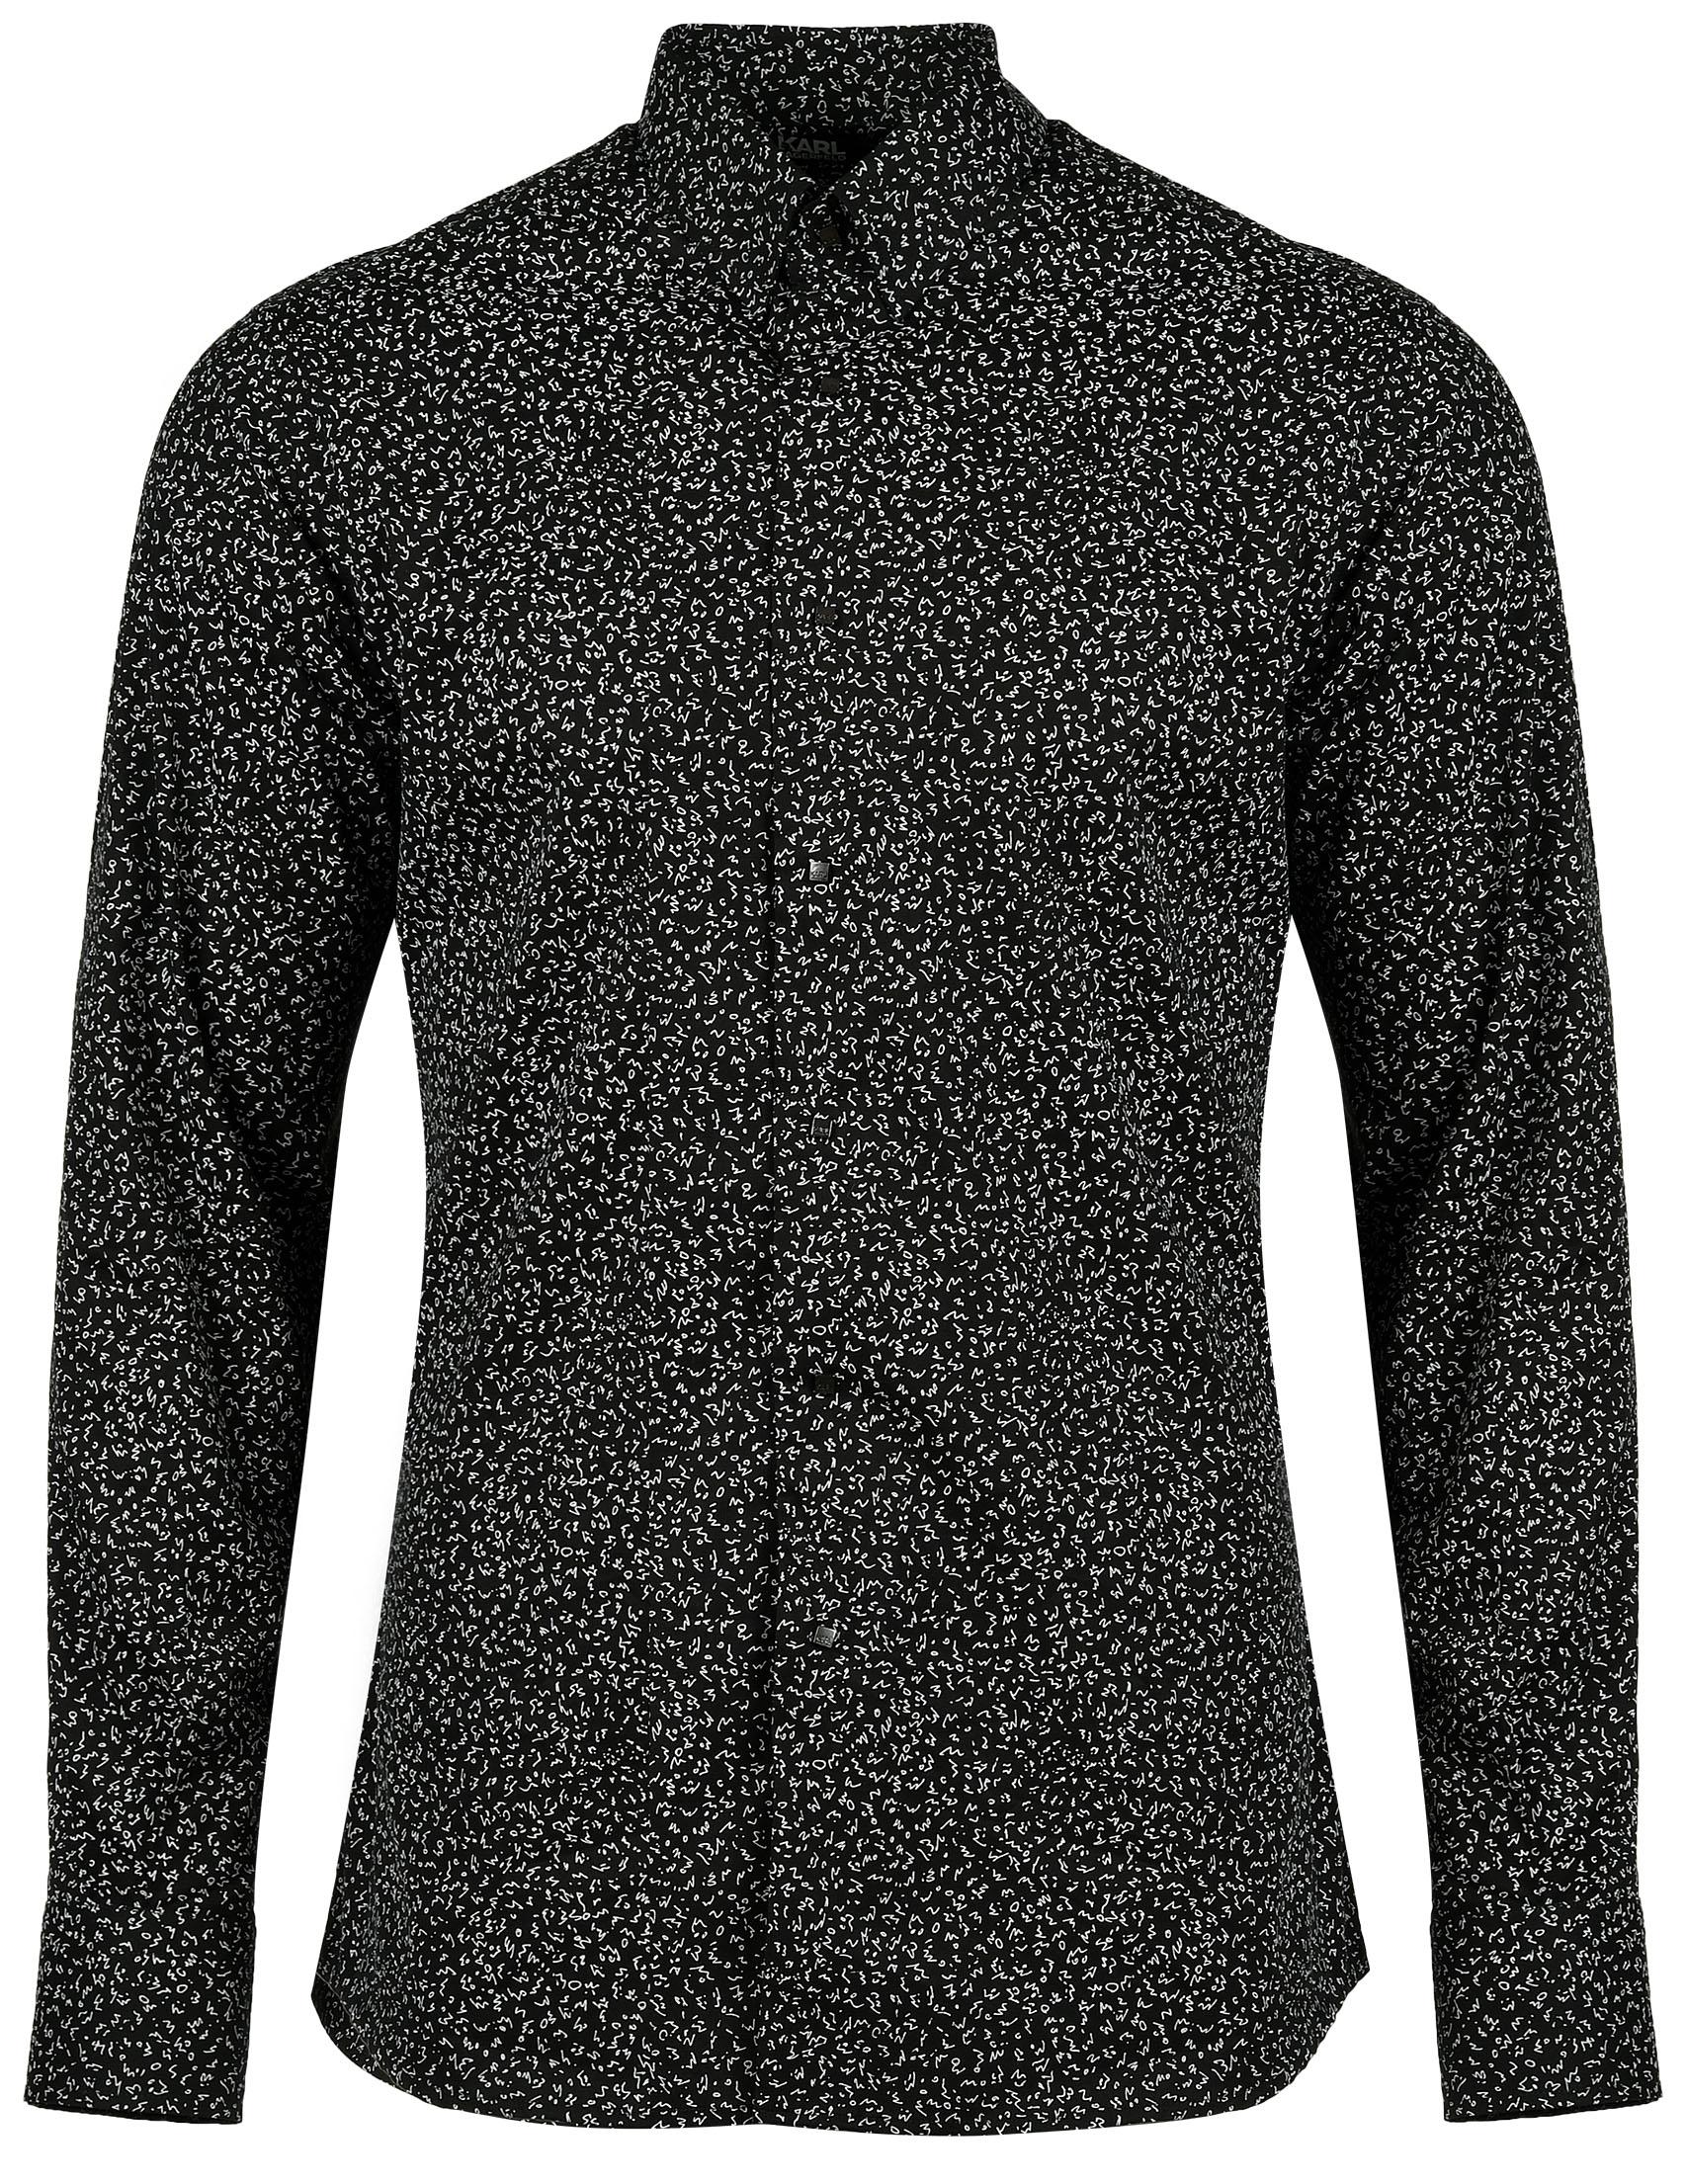 Рубашка KARL LAGERFELD 605000582616-991